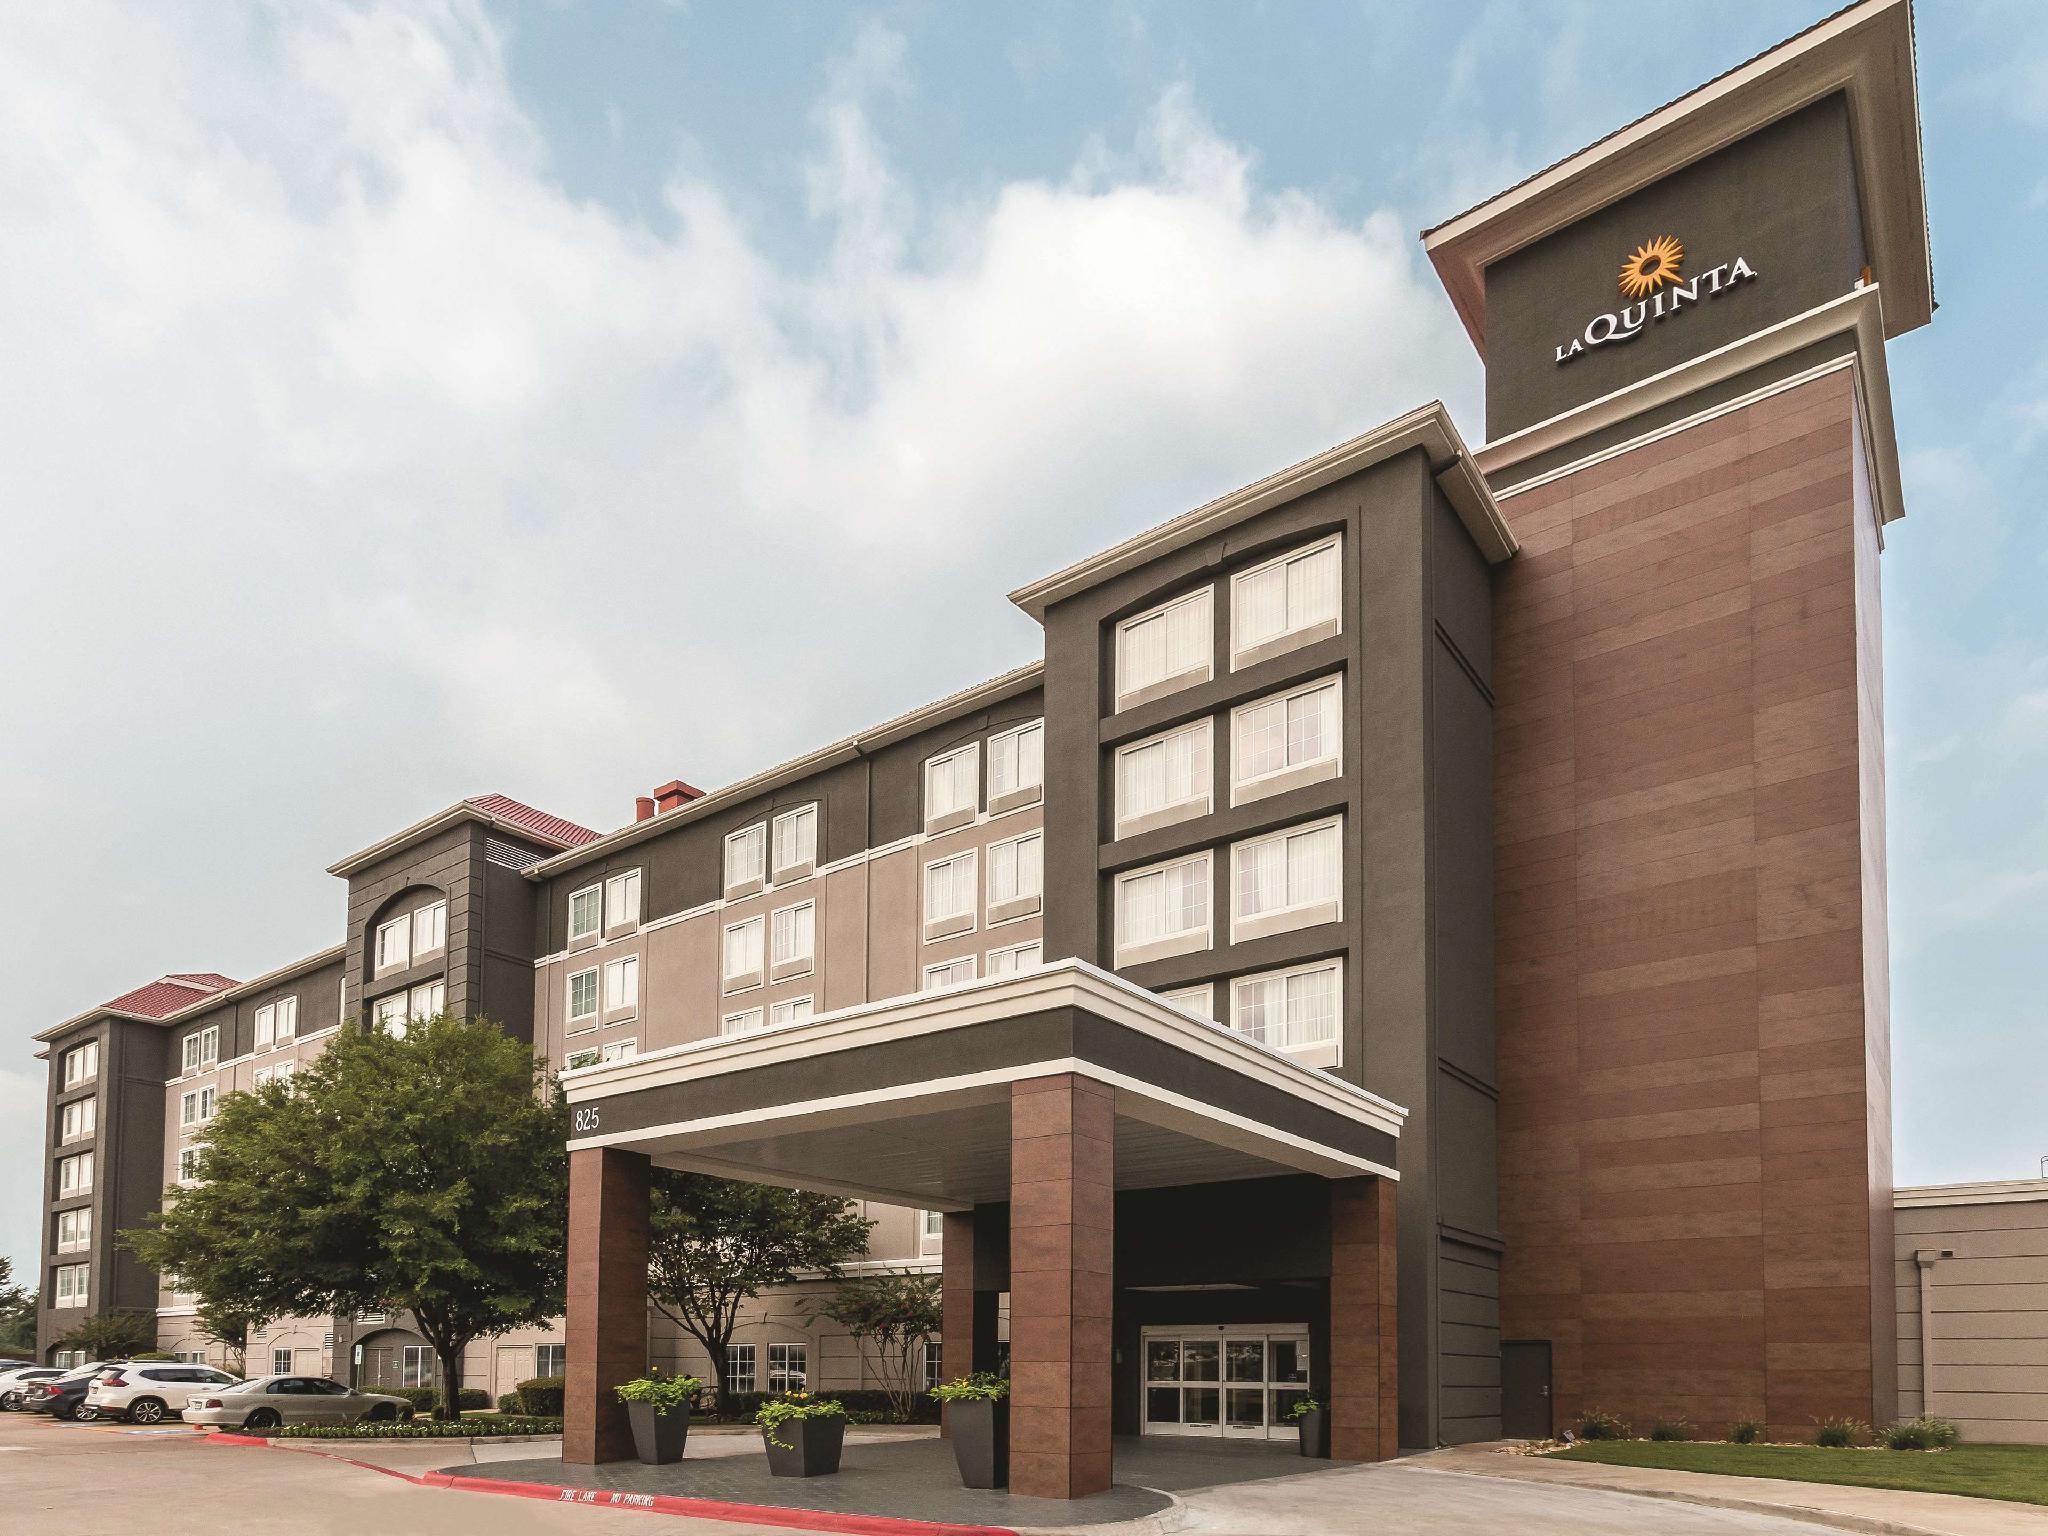 La Quinta Inn And Suites By Wyndham Arlington North 6 Flags Dr